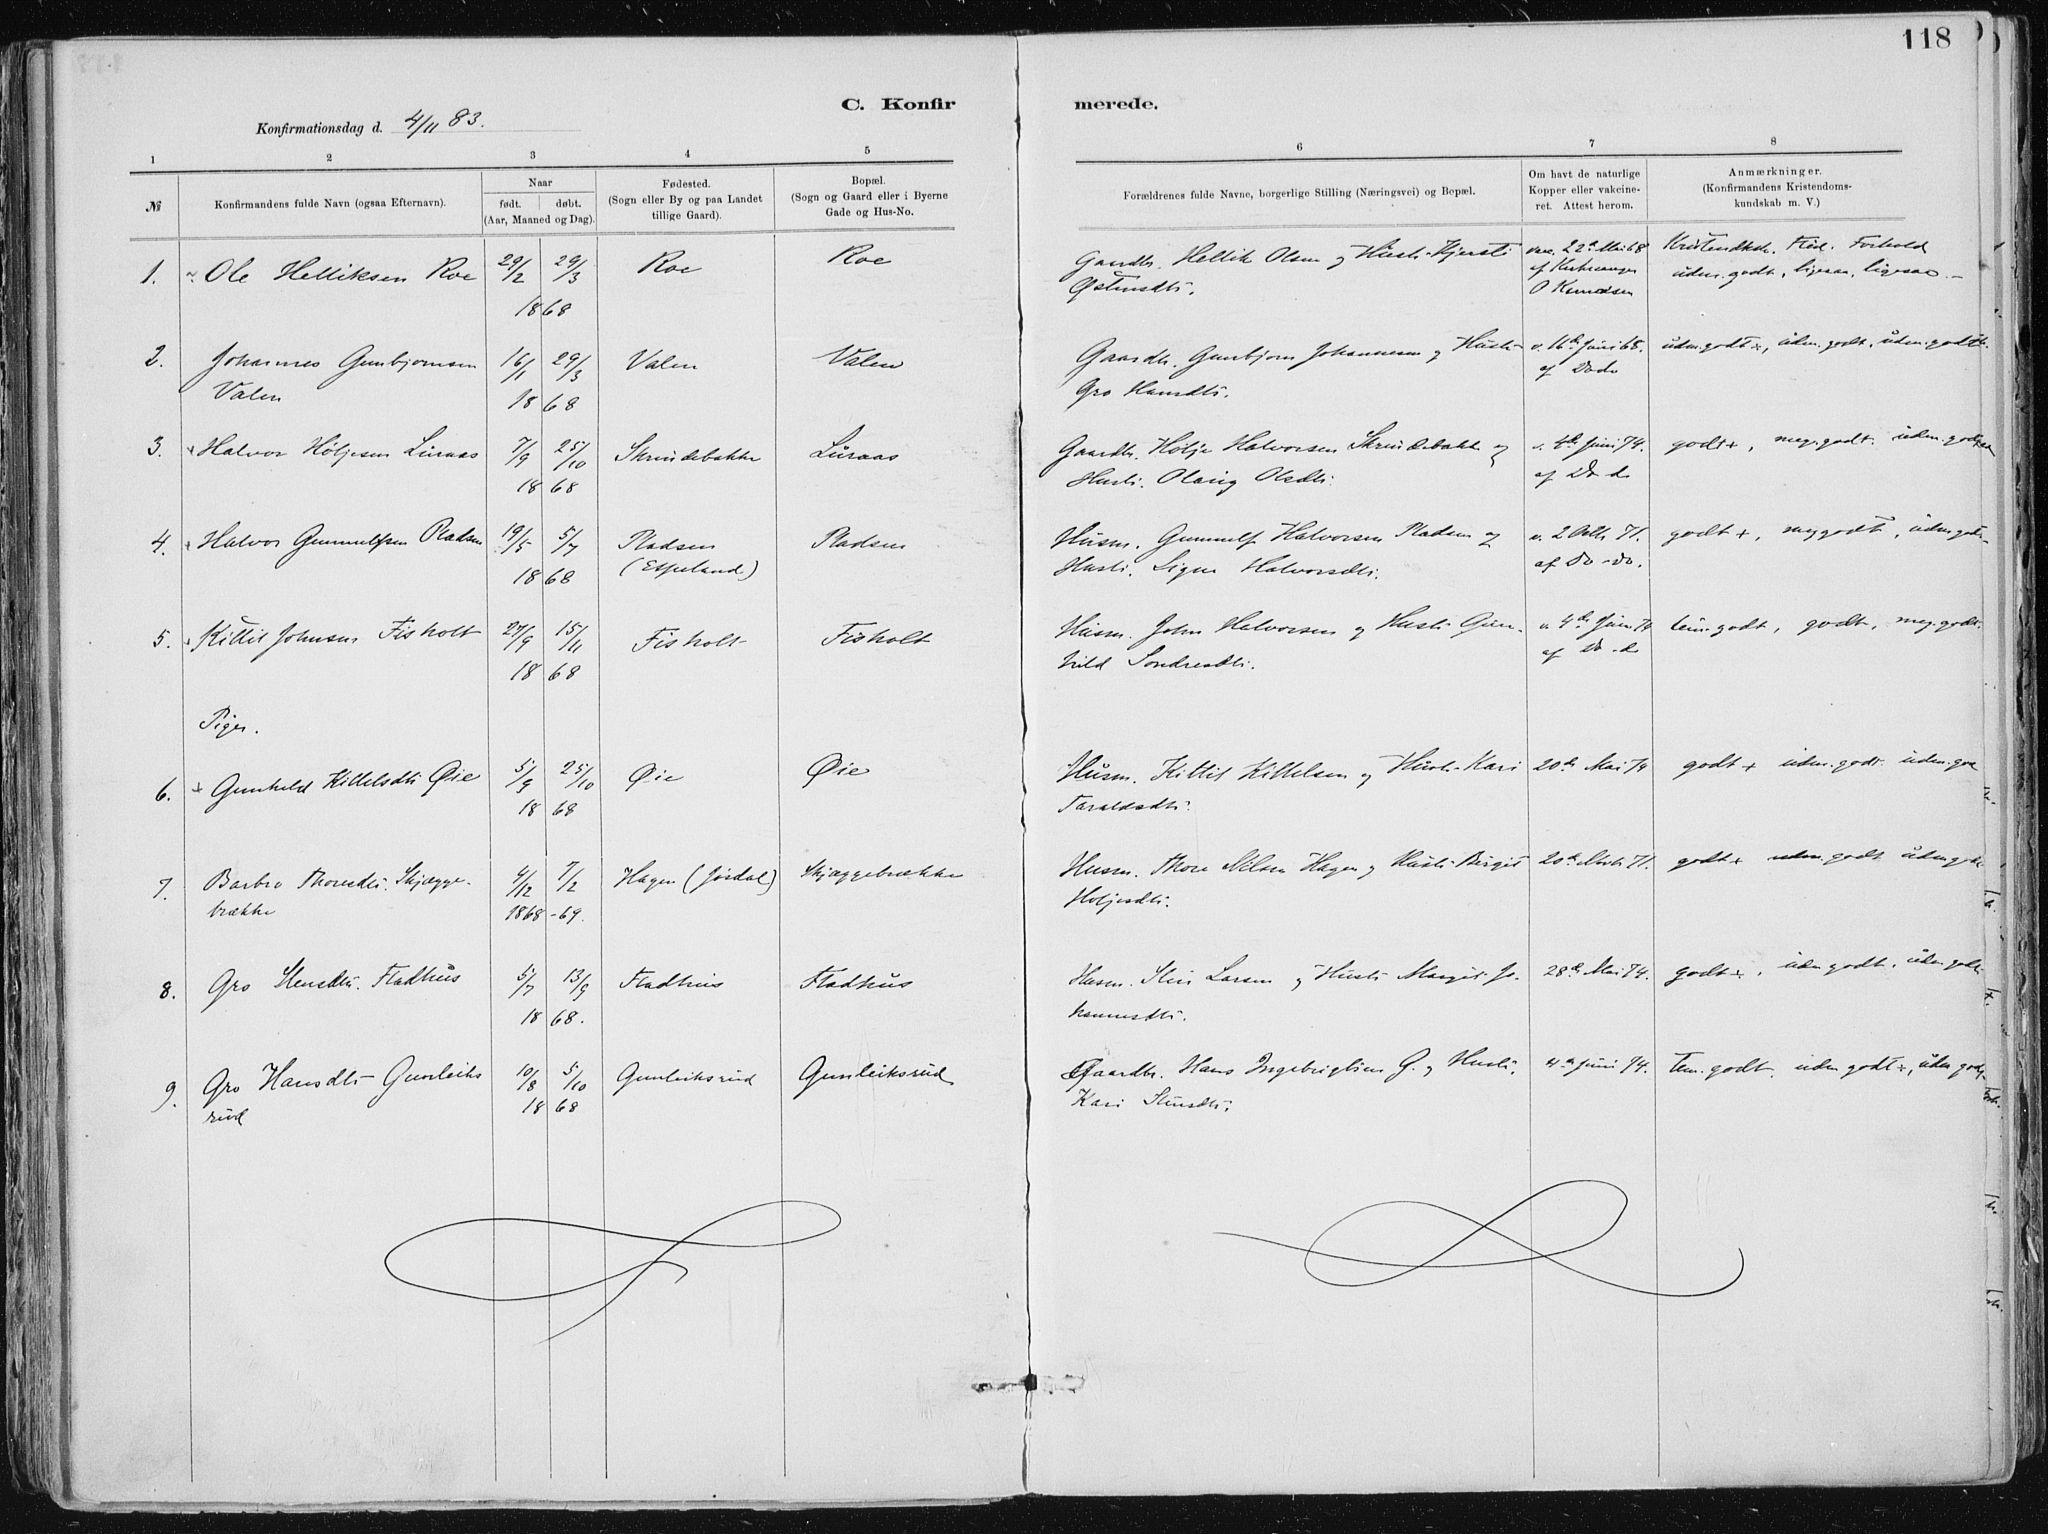 SAKO, Tinn kirkebøker, F/Fa/L0007: Ministerialbok nr. I 7, 1878-1922, s. 118